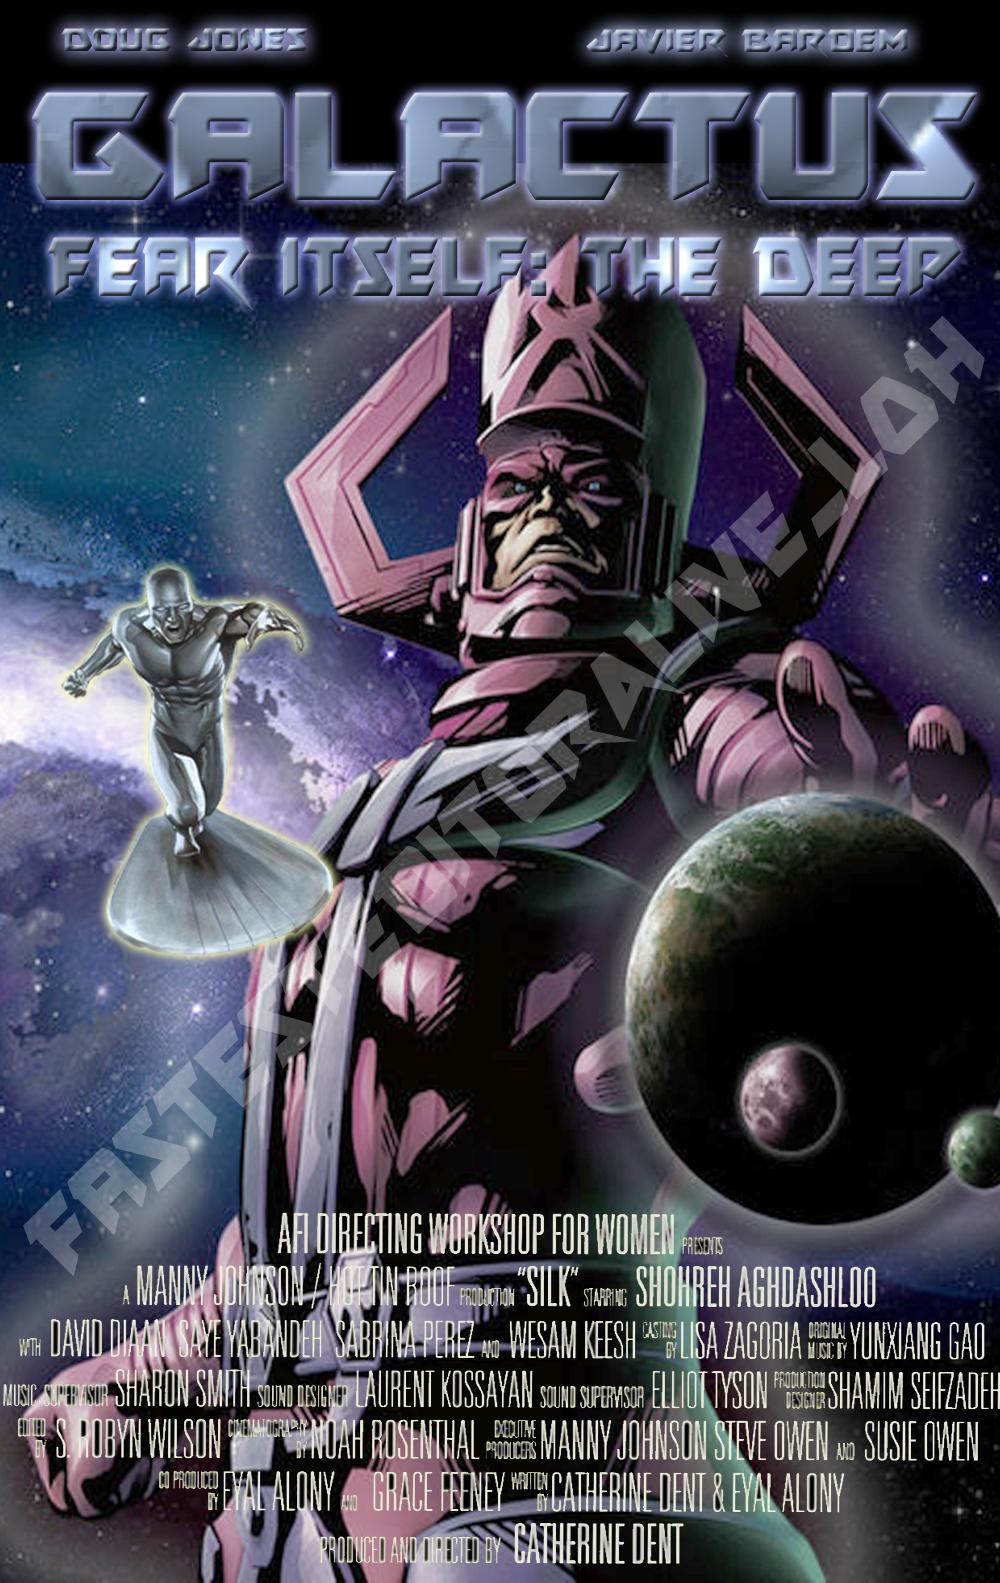 Galactus Movie Poster by WNieborg on DeviantArt